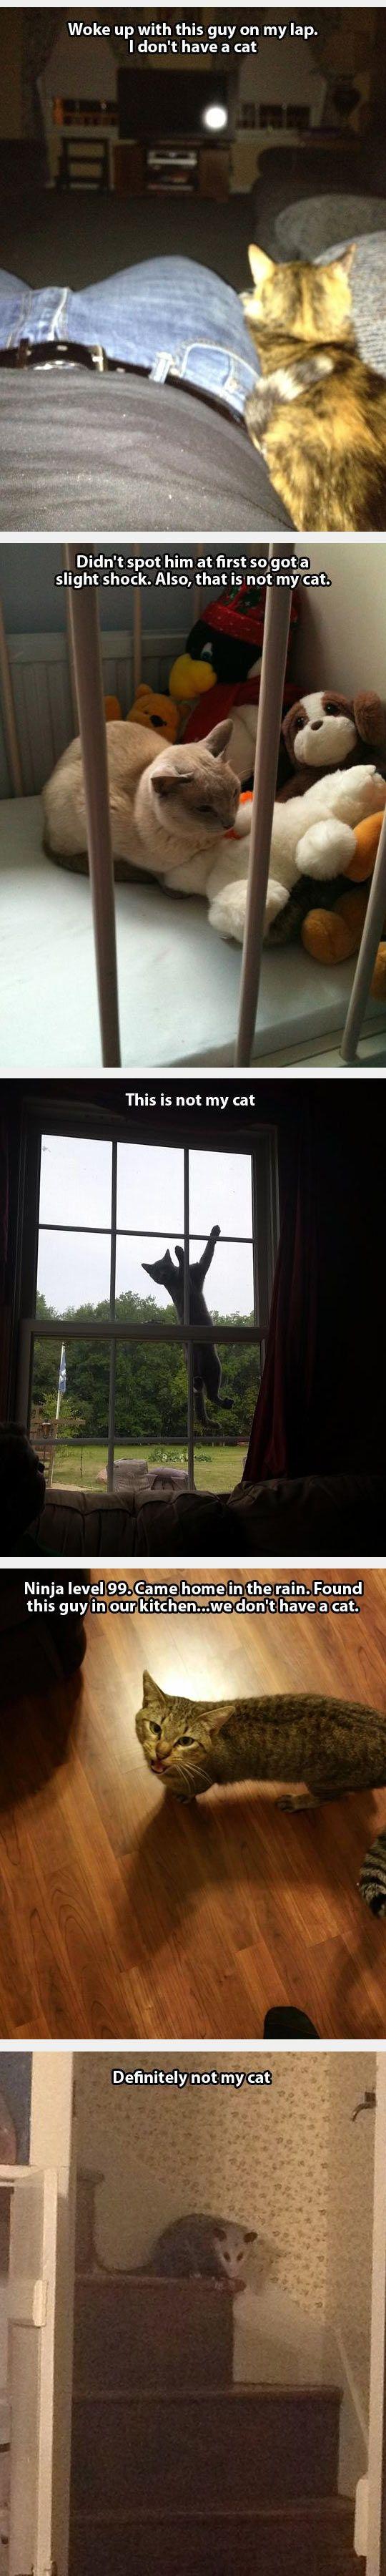 That's not my cat. Lol.